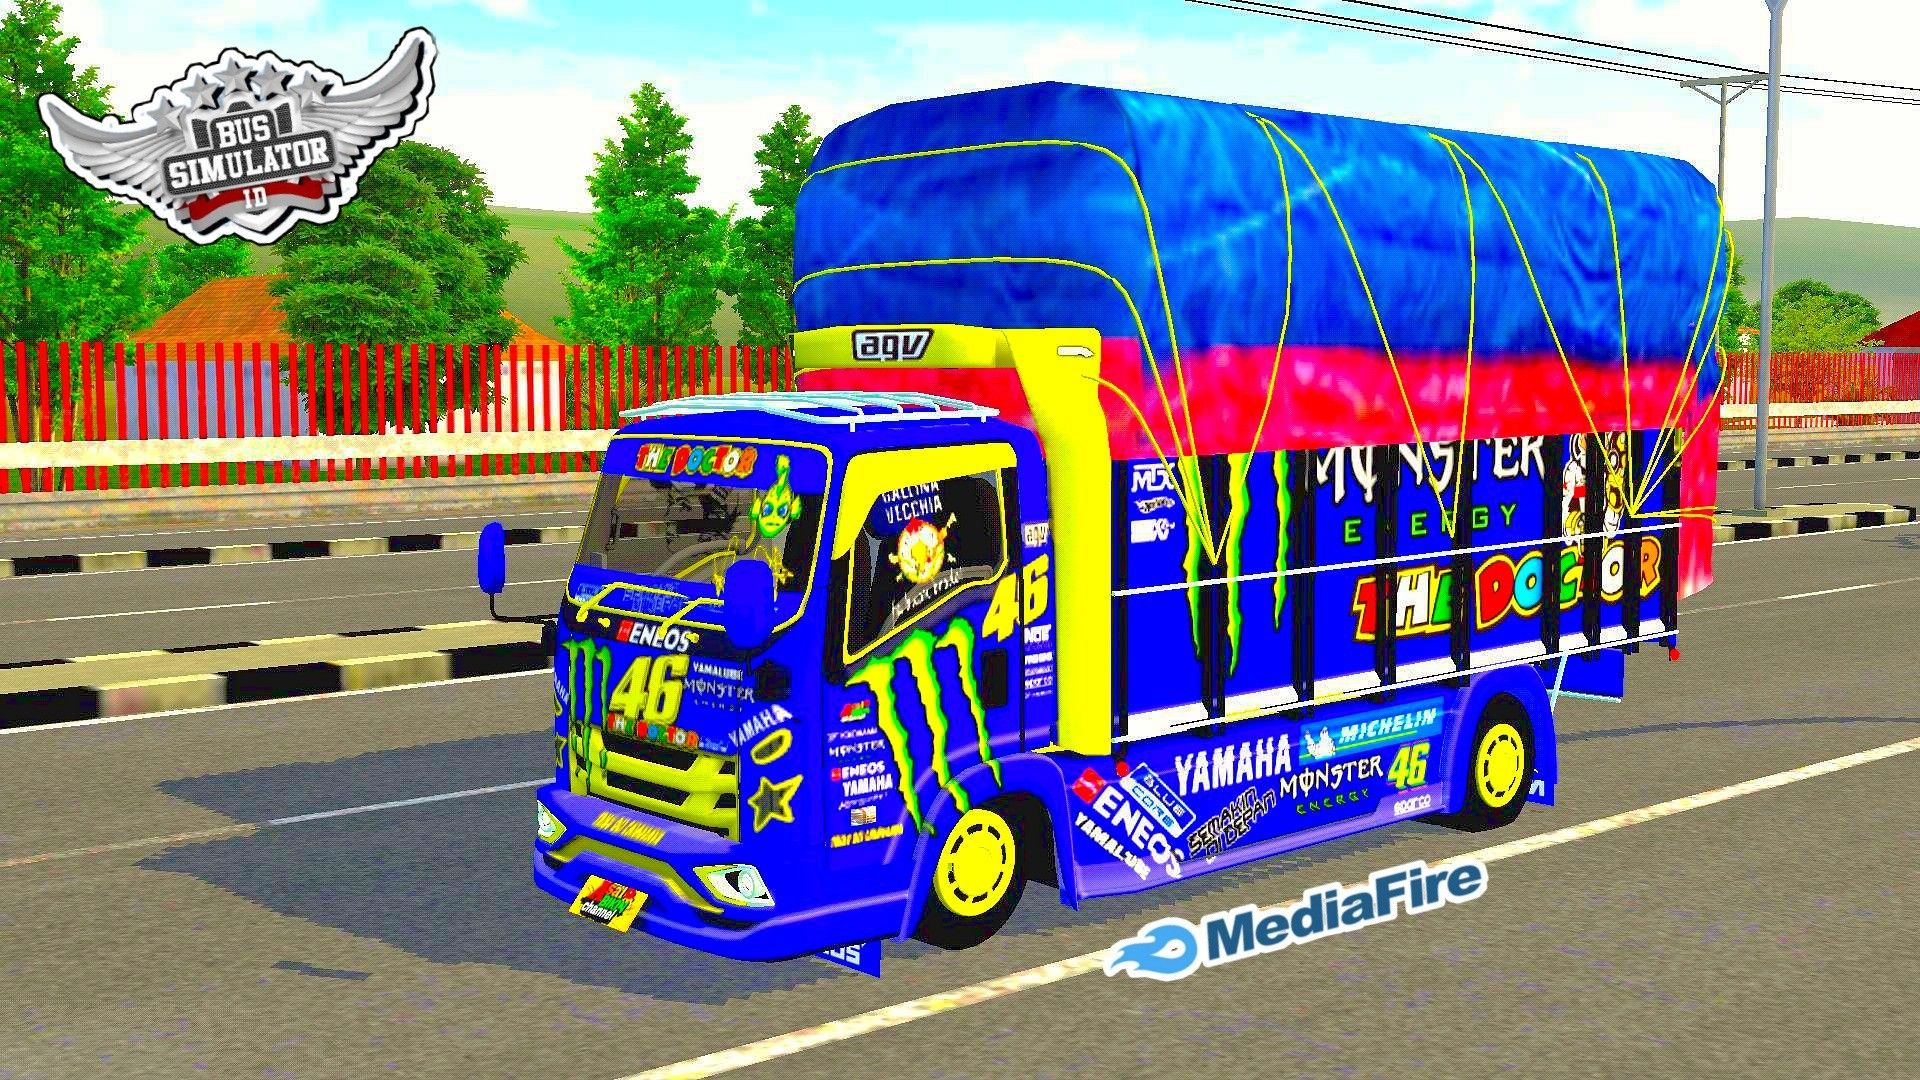 Mod Truck Stiker Valentino Rossi Bus Simulator Indonesia Di 2021 Mobil Futuristik Konsep Mobil Truk Besar